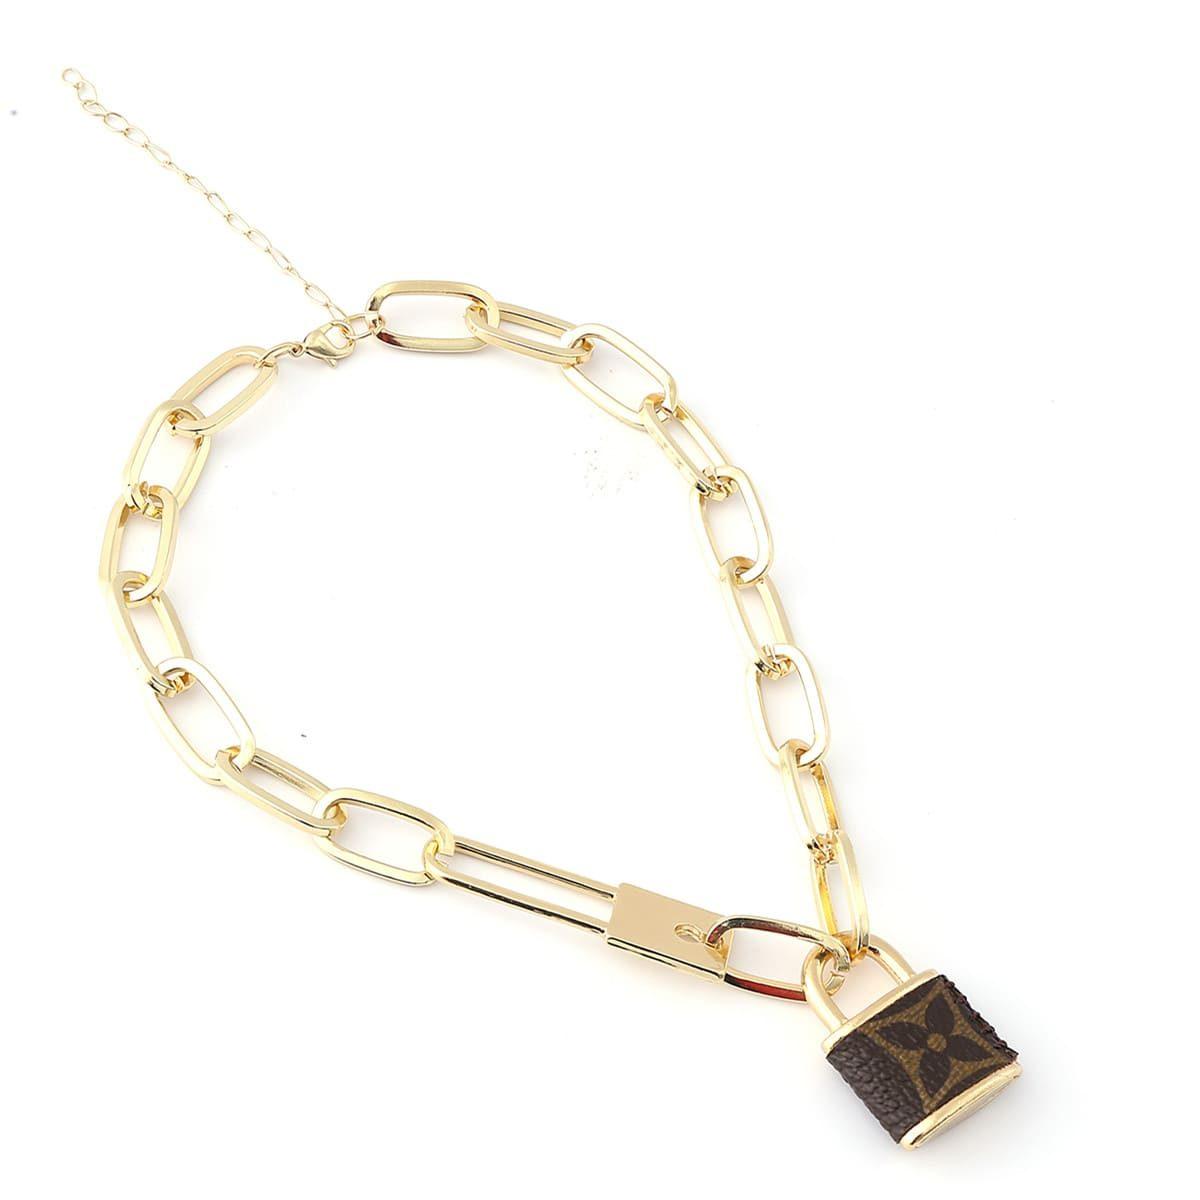 fashion-monogram-necklace-made-of-upcycled-lv